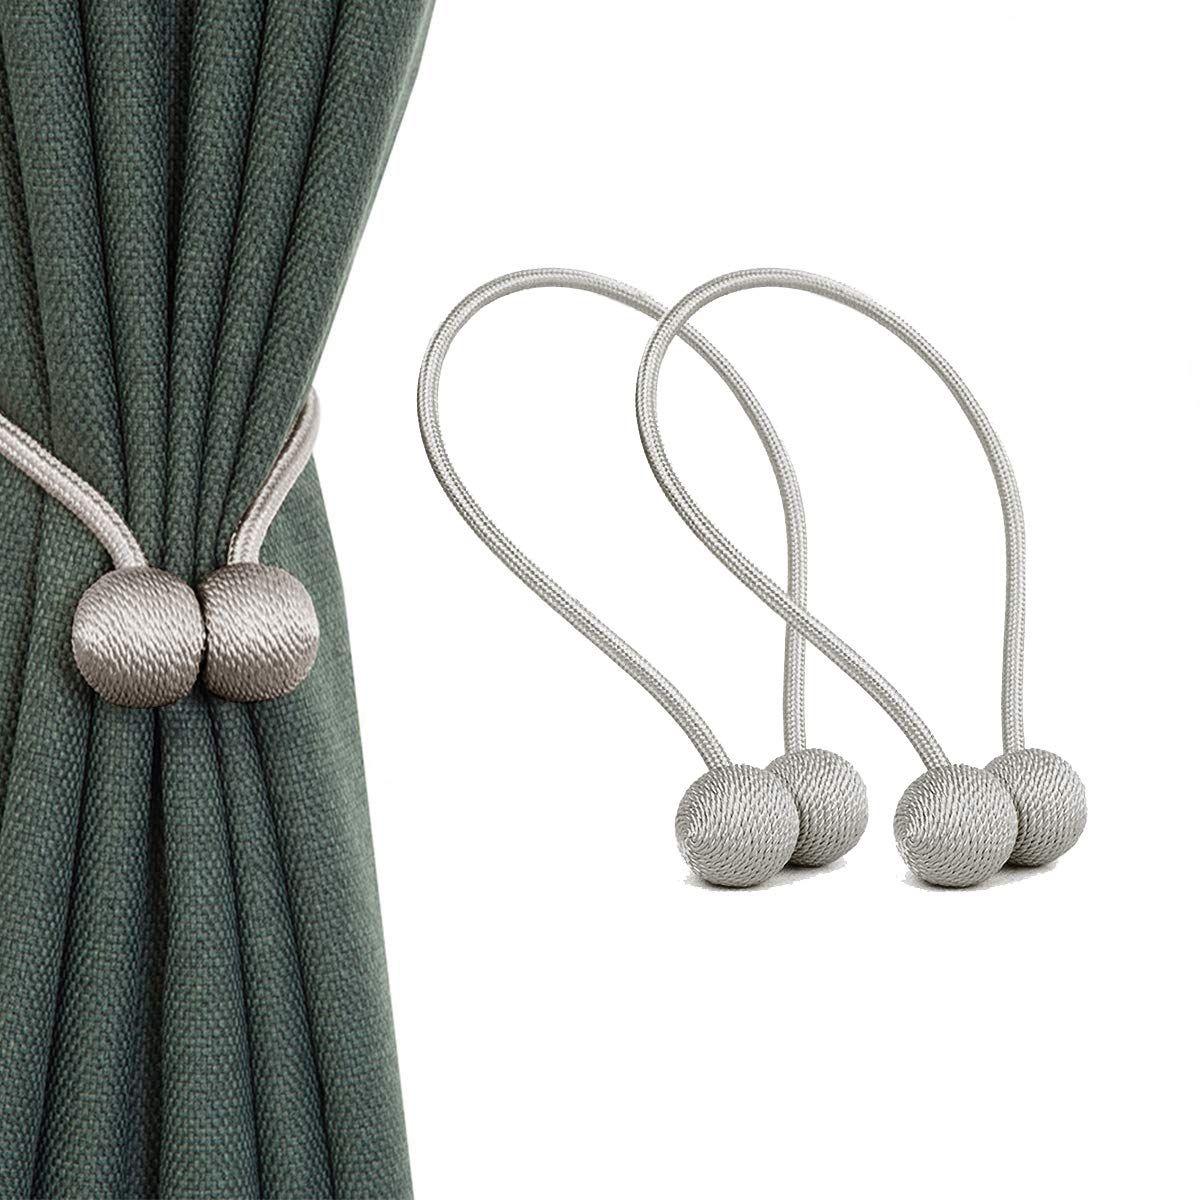 Baeima Magnetic Curtain Tiebacks Convenient Drape Tie Backs